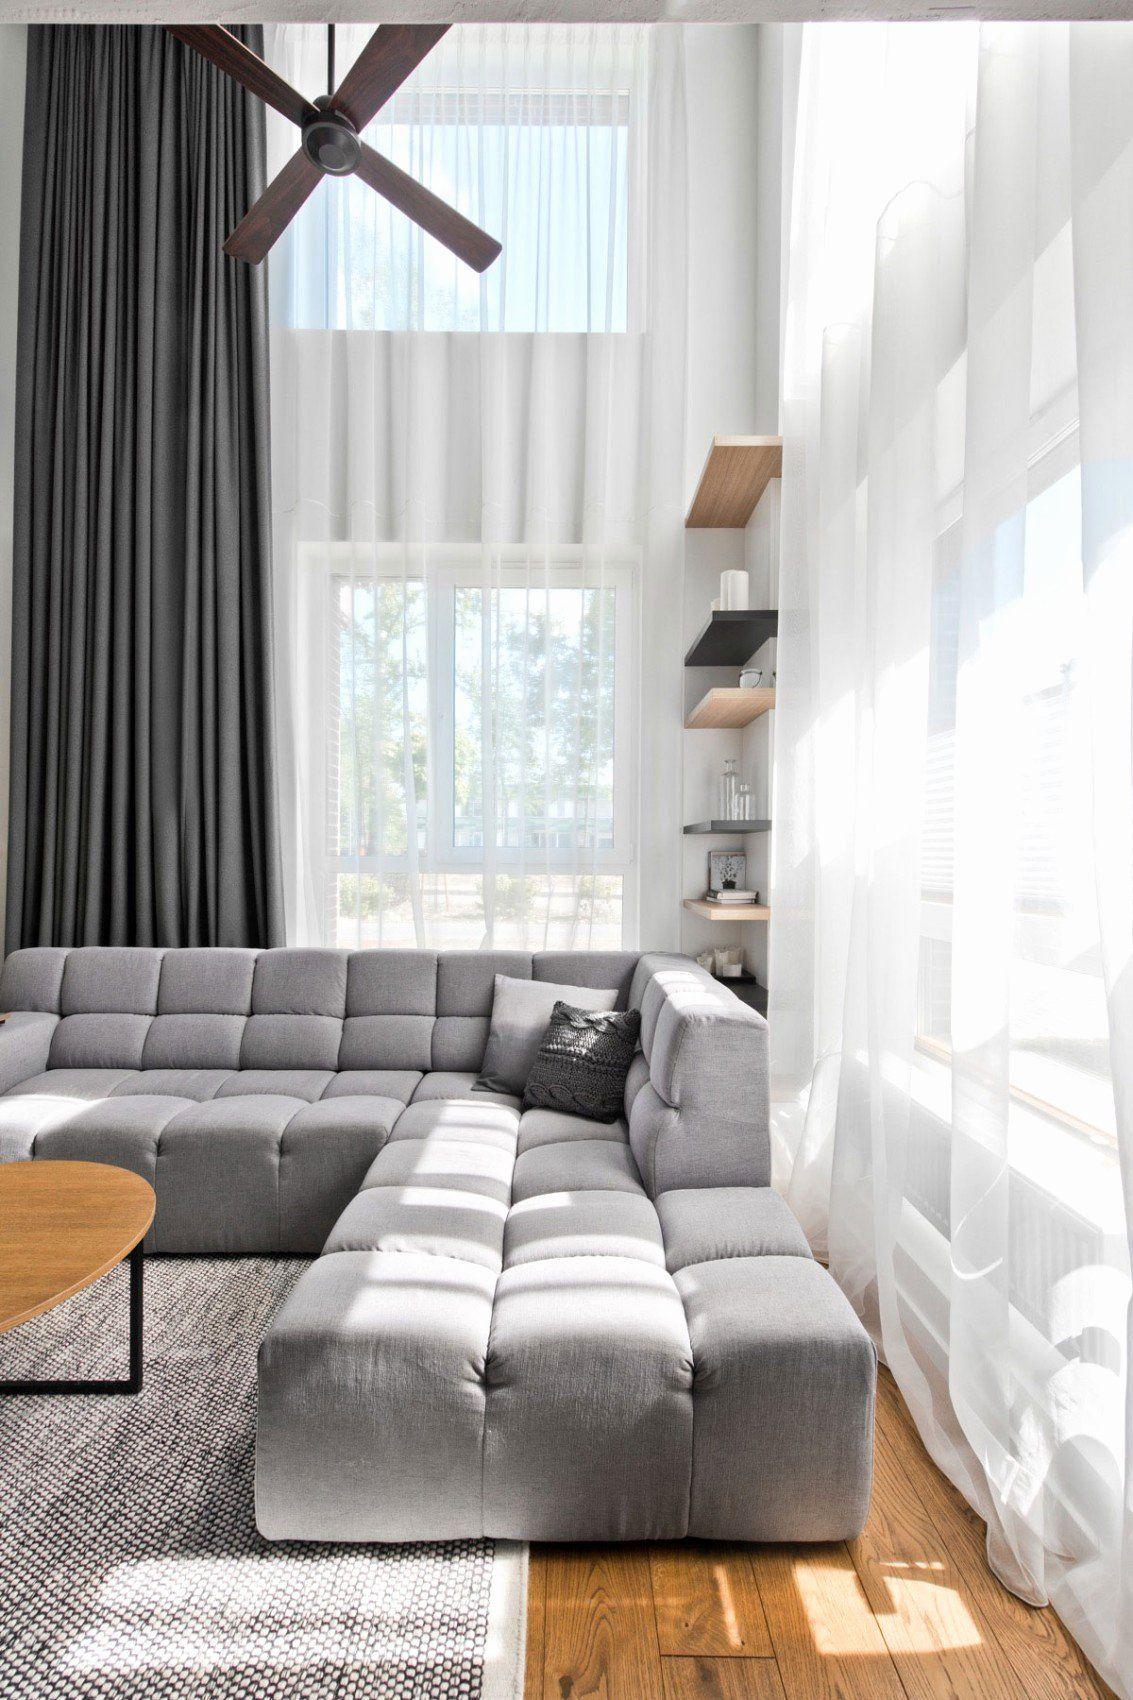 Scandinavian Interior Design Small Apartment Fresh Scandinavian Interior Design In A Bea In 2020 Living Room Design Modern Apartment Interior Apartment Interior Design